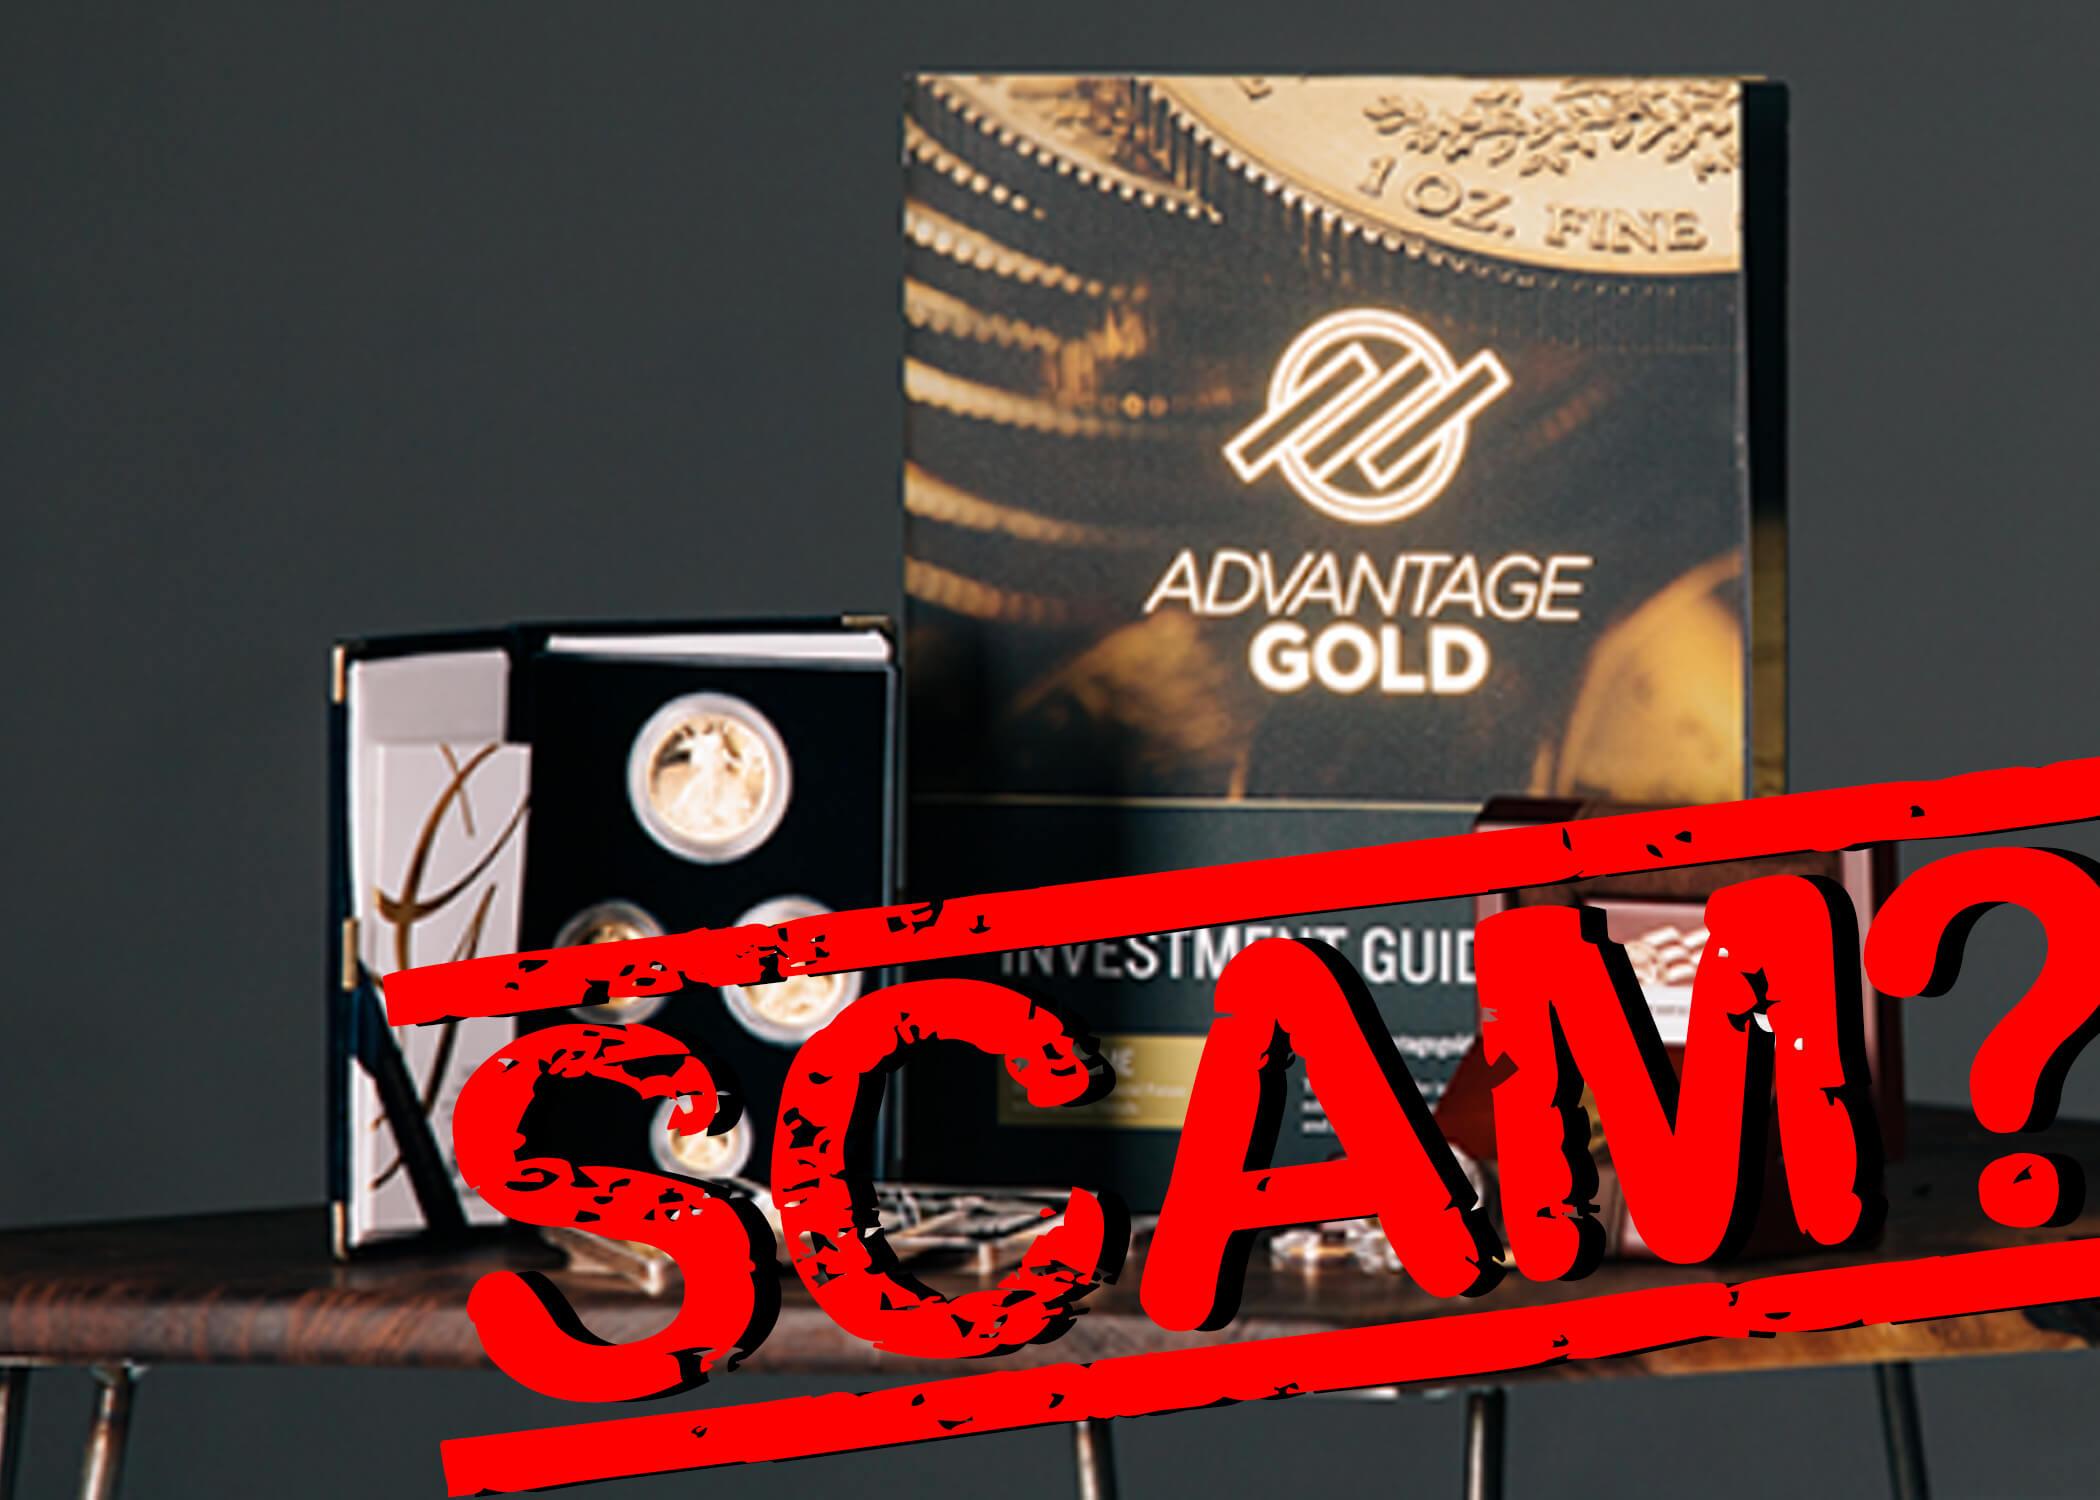 Is Advantage Gold a scam?